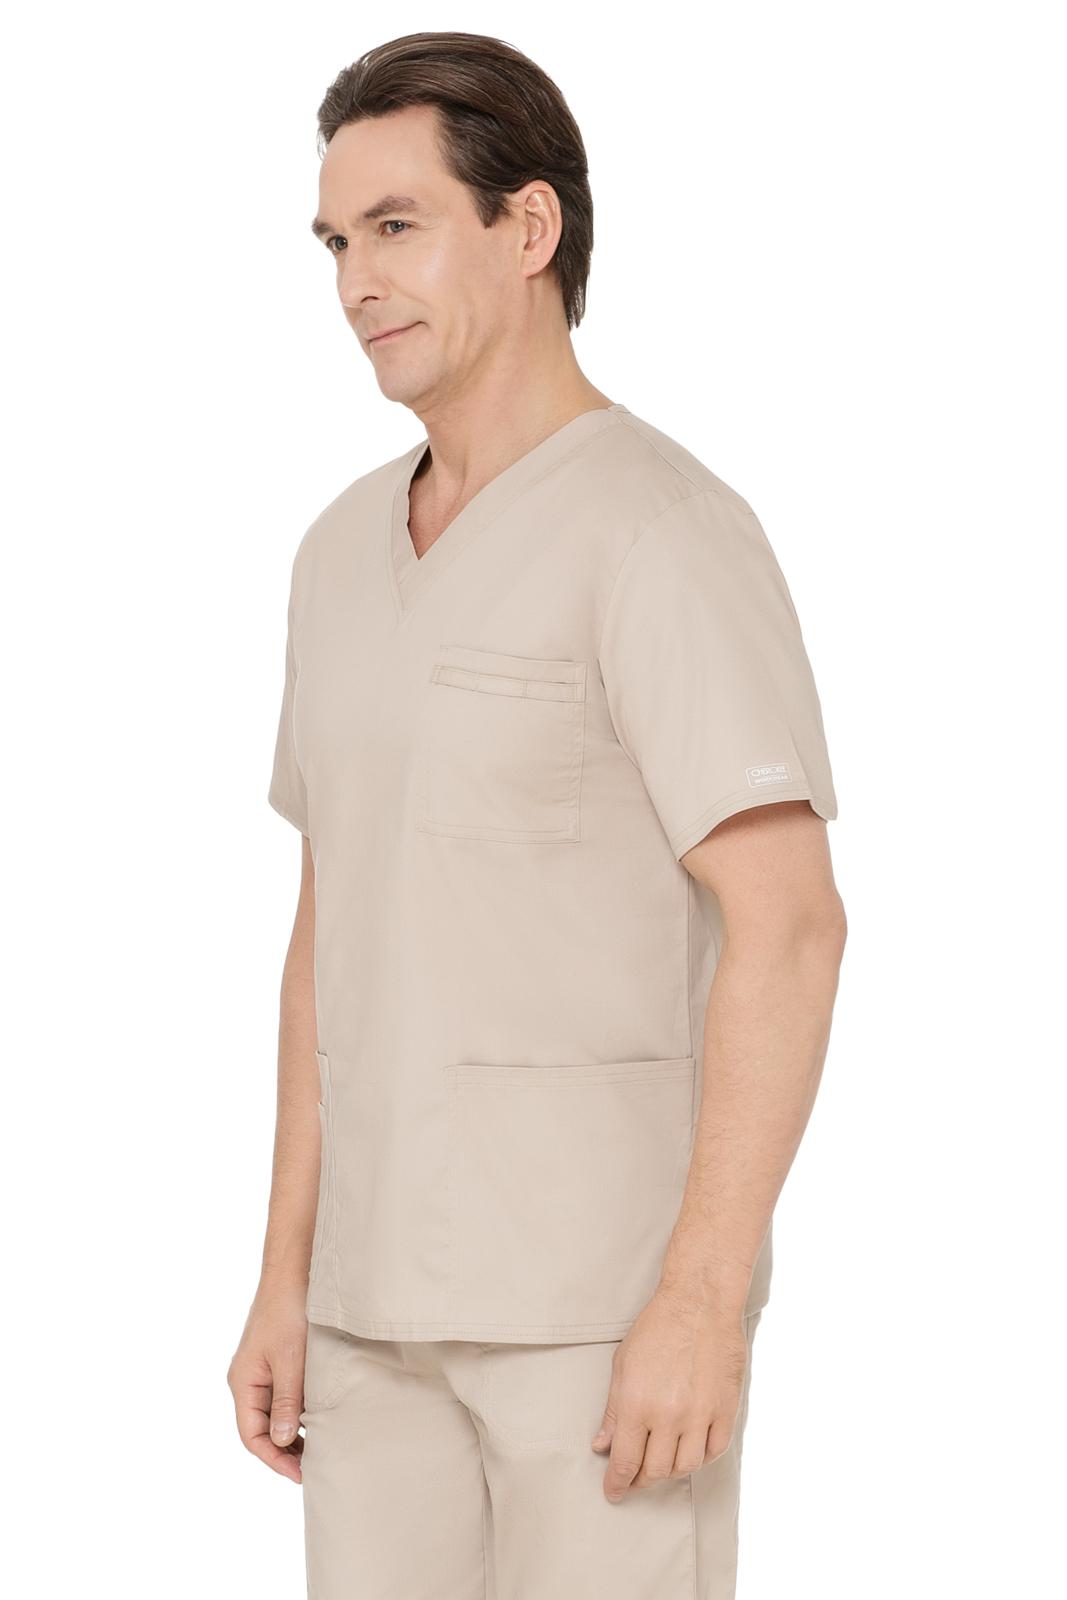 Топ унисекс Cherokee Workwear